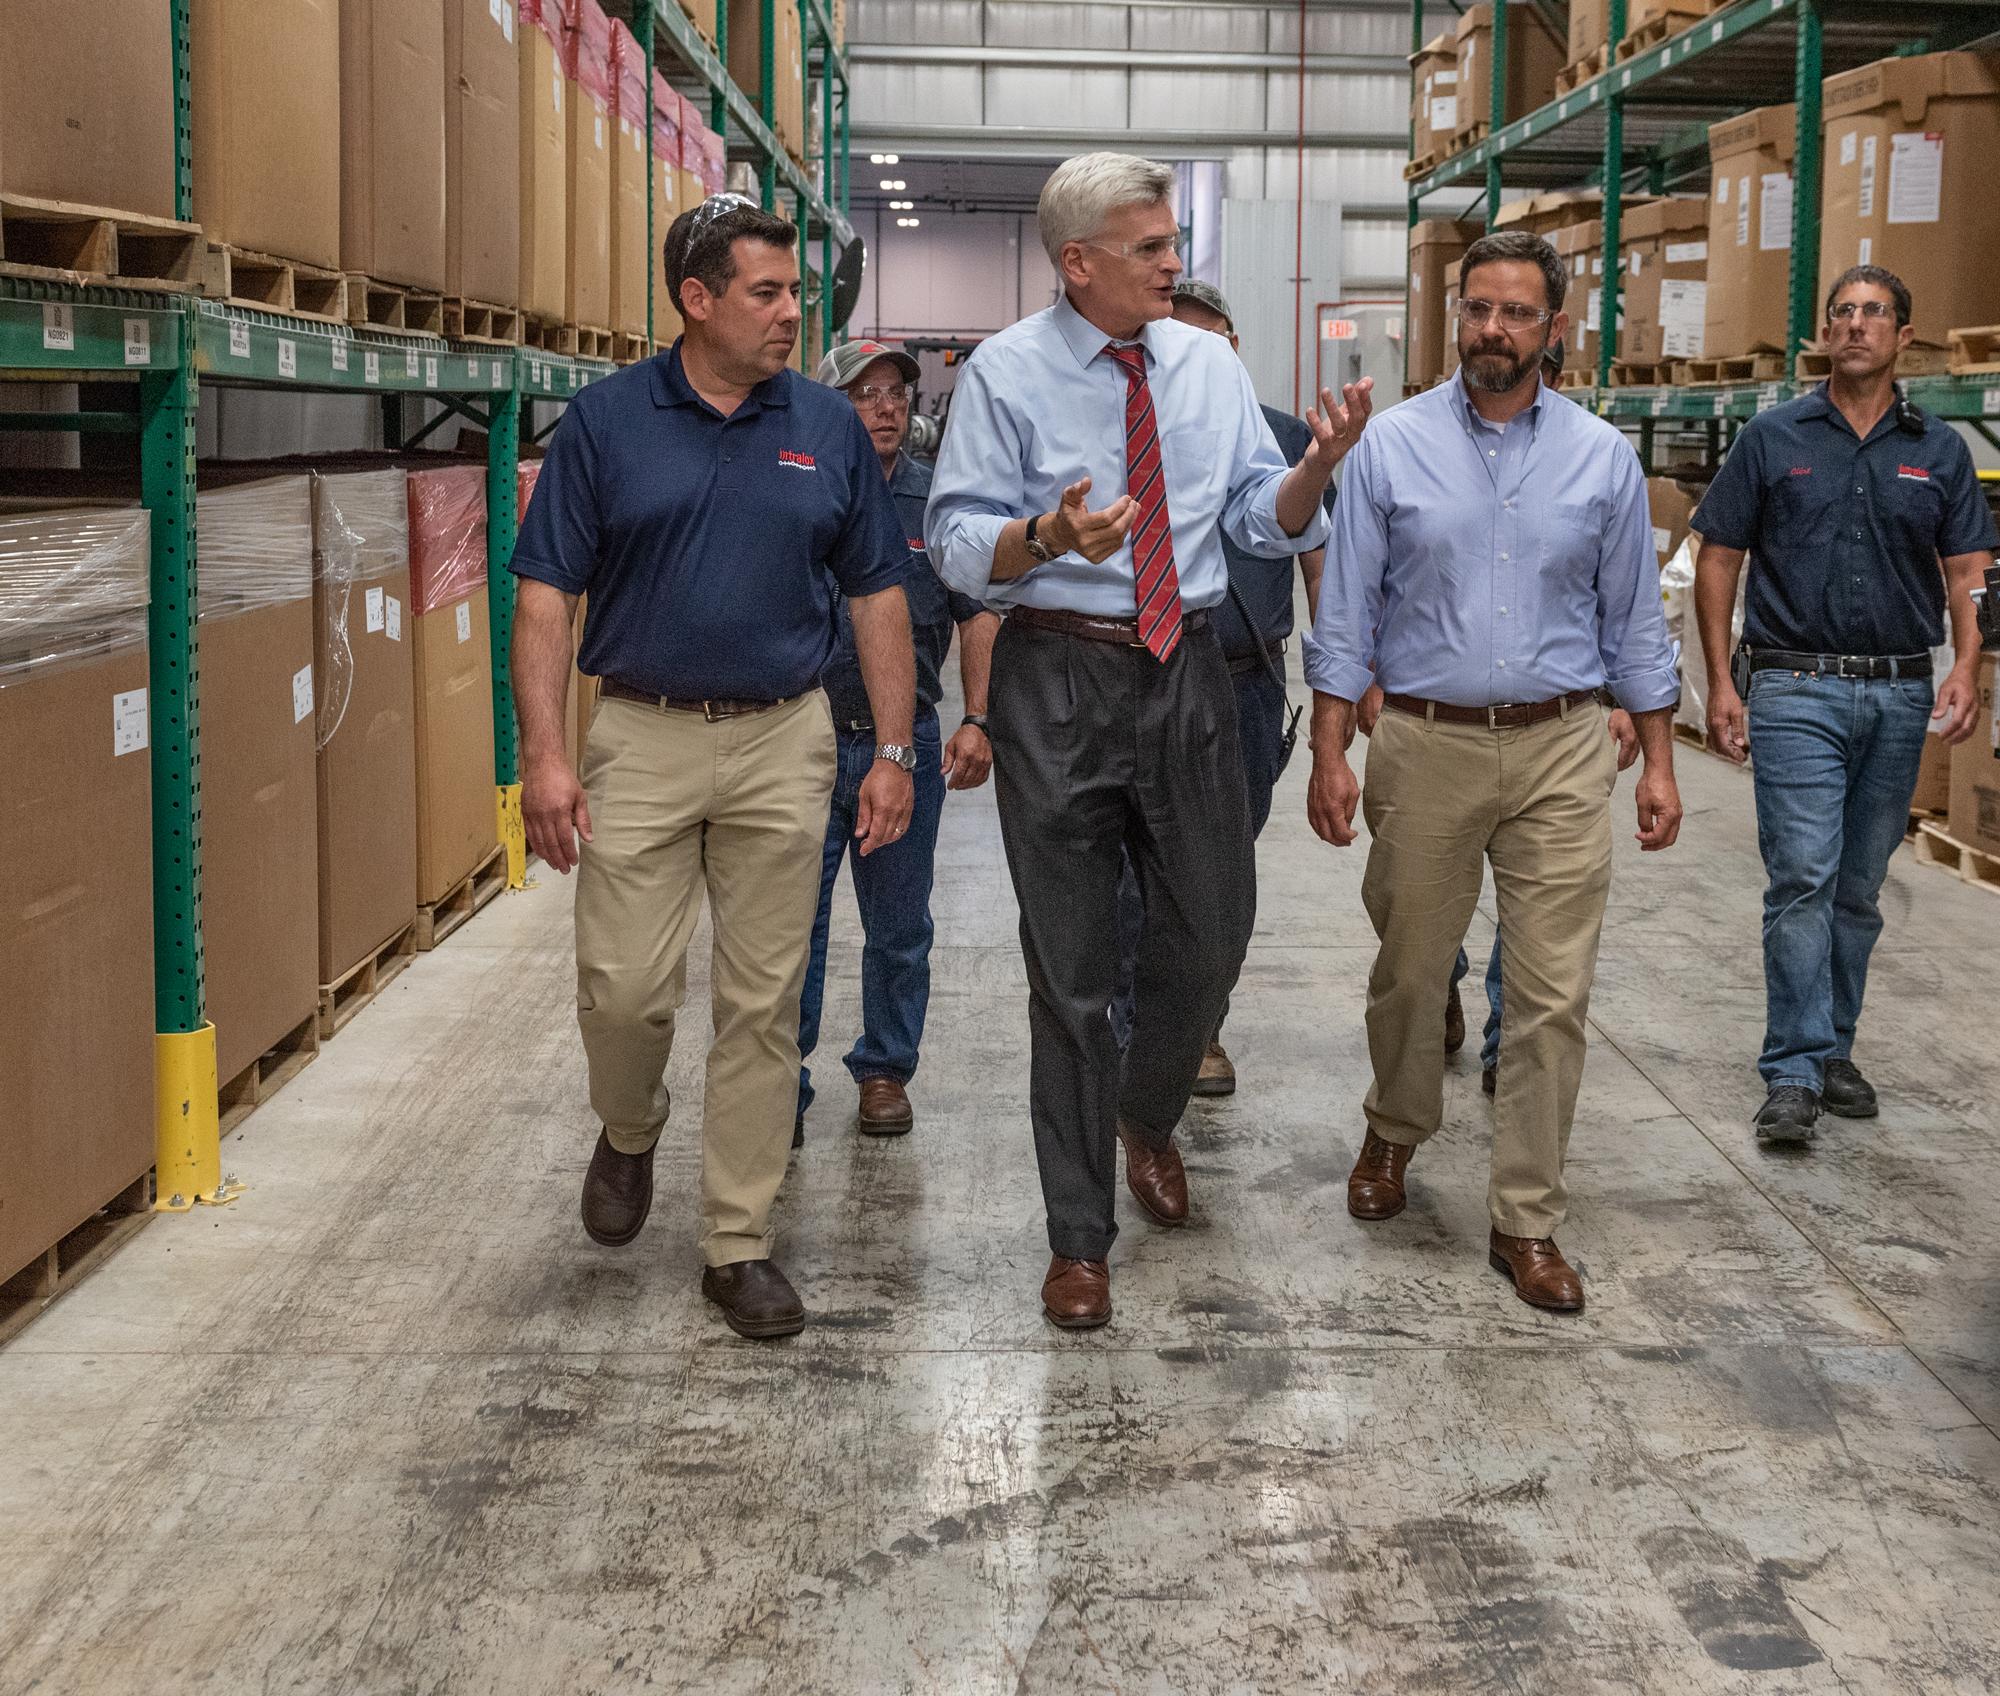 Working for Louisiana | 4.17.2020 Update